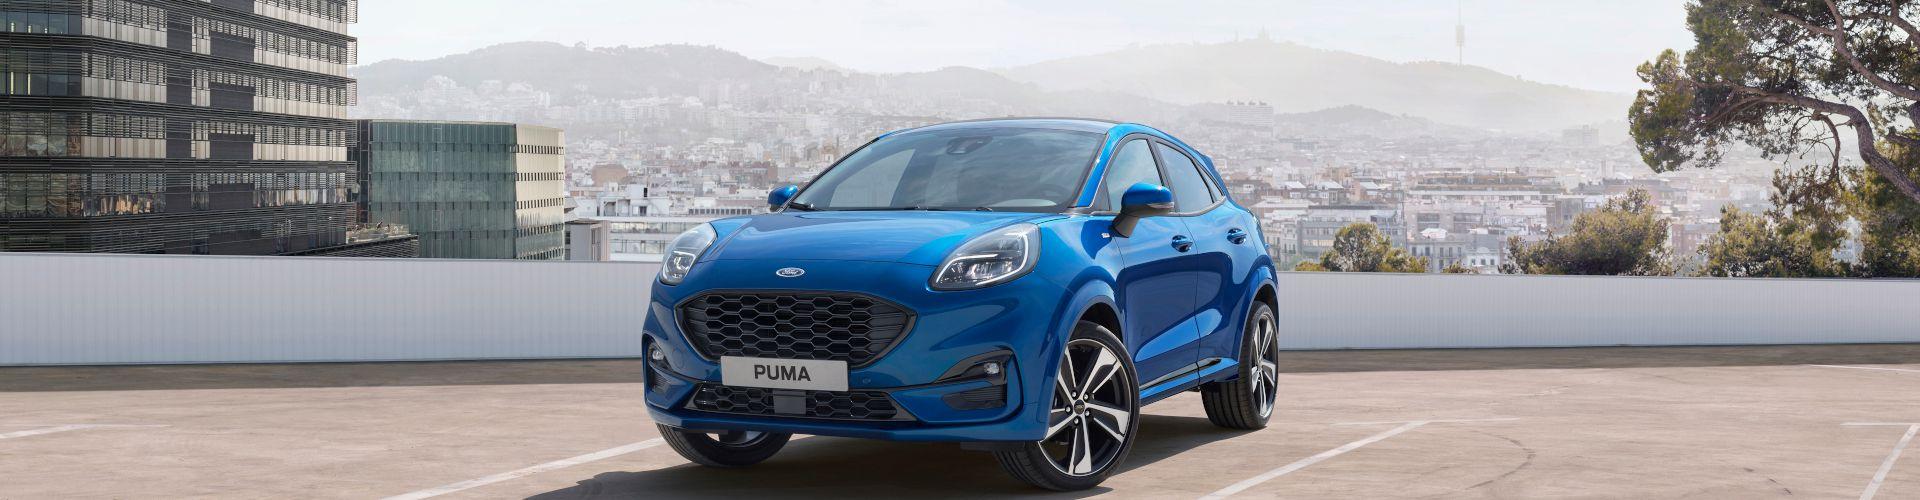 Ford Puma ST Line - Α. Λιάπης Αντιπροσωπεία